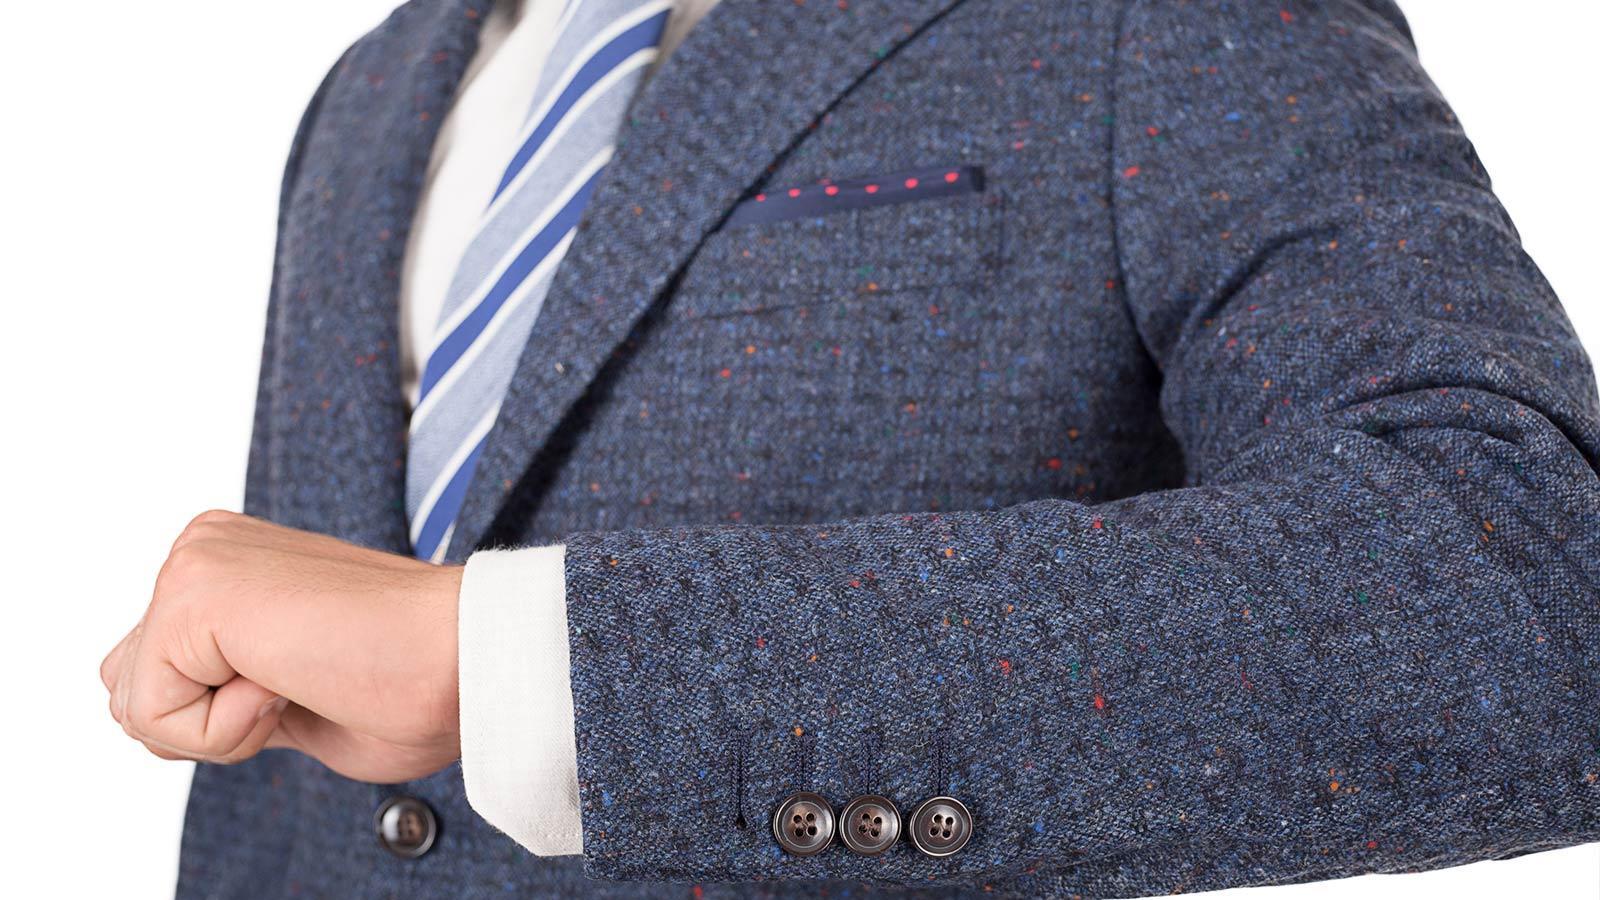 Suit in Blue Donegal Shadow Tweed - slider image 1